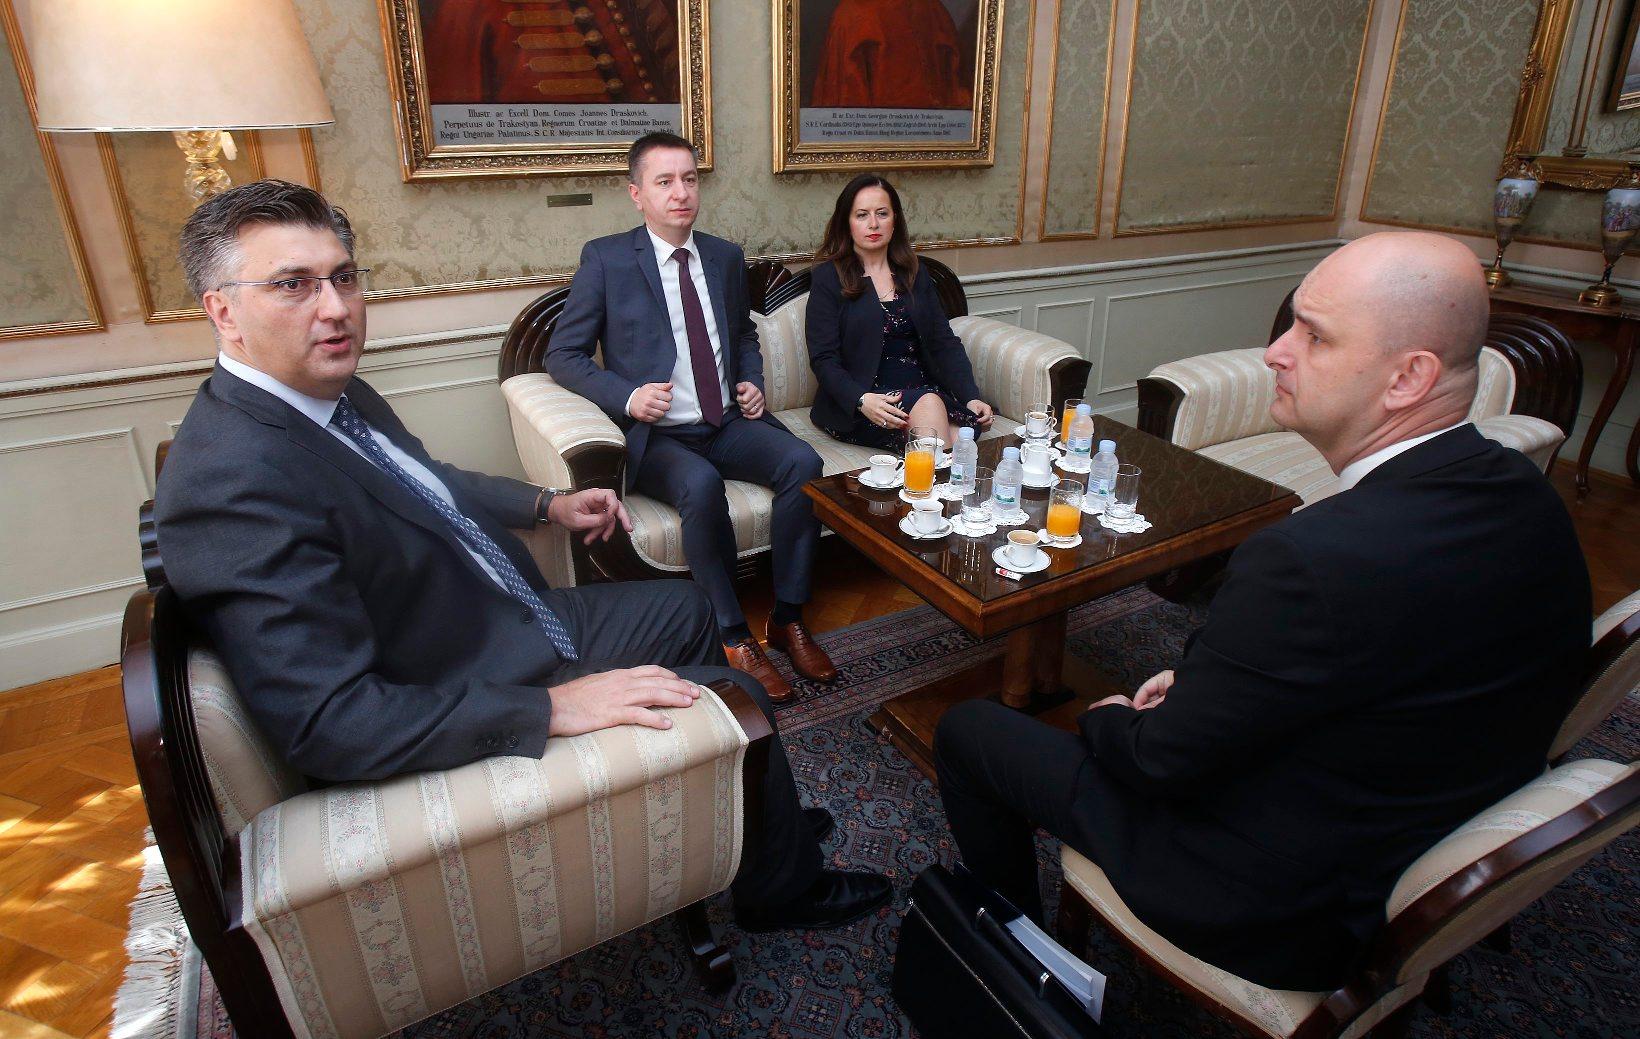 Andrej Plenković, Fabris Peruško, Irena Weber, Tomislav Tolušić